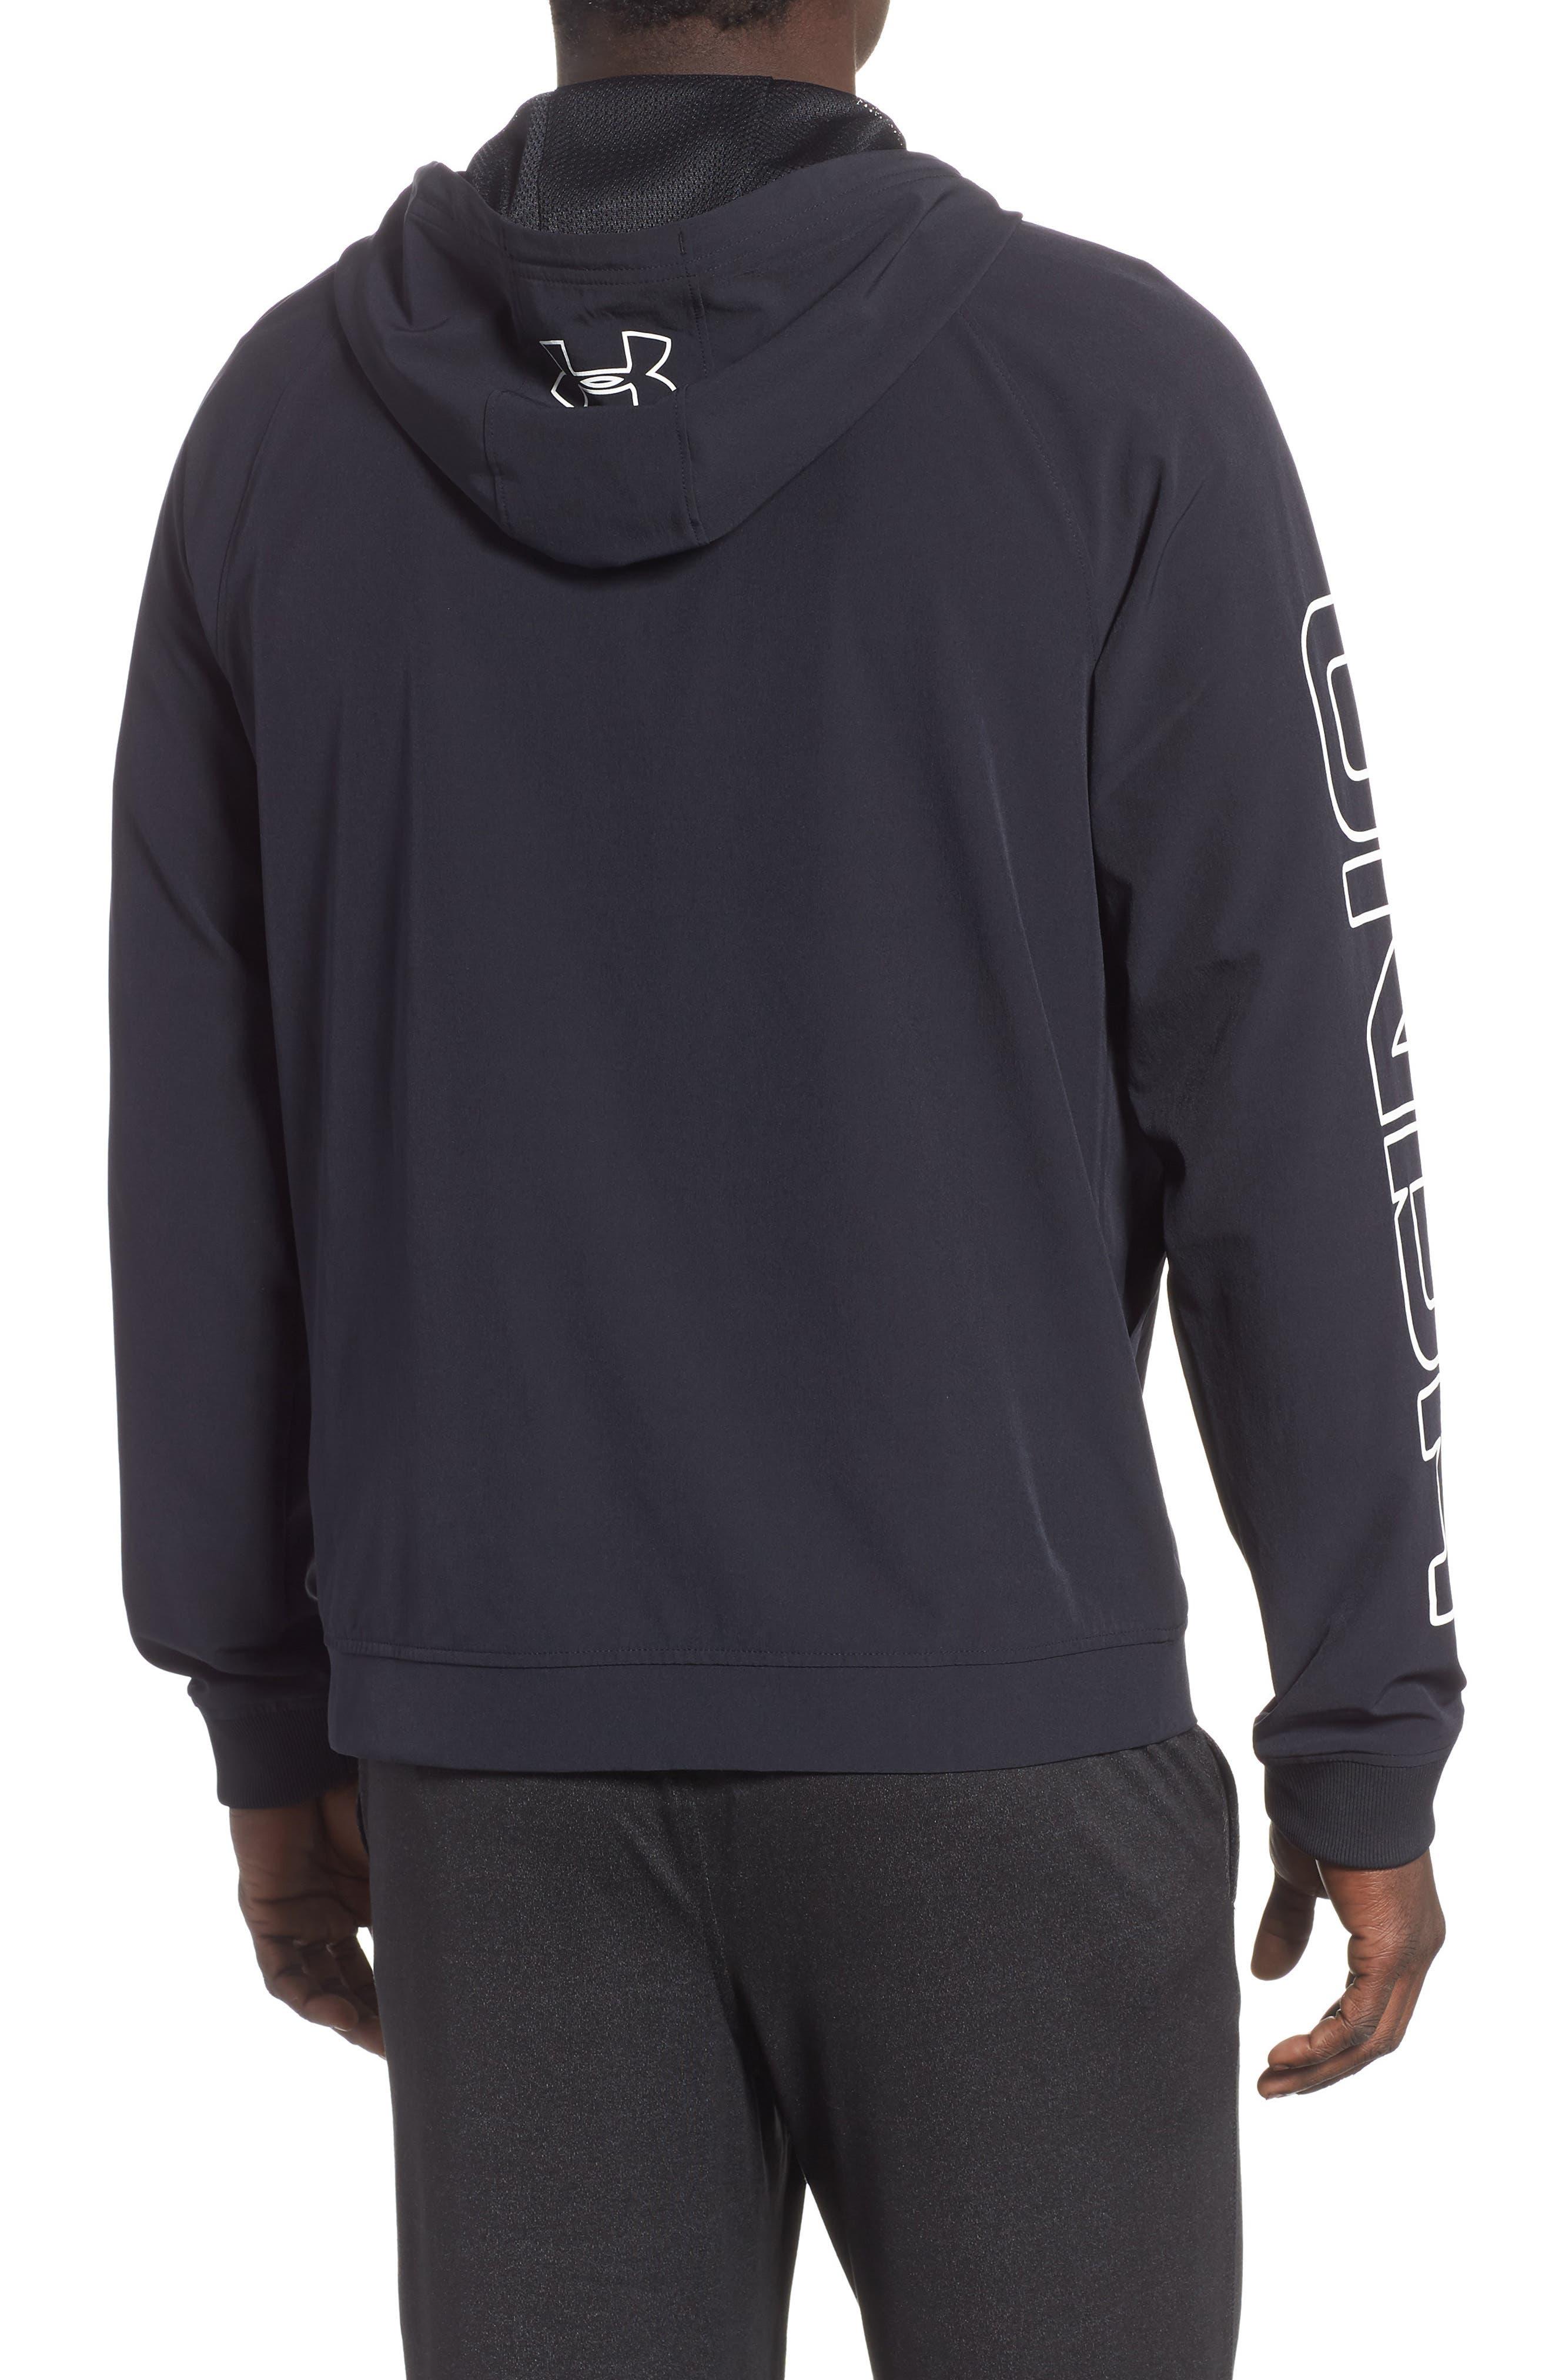 UNDER ARMOUR, Baseline Hooded Jacket, Alternate thumbnail 2, color, 001